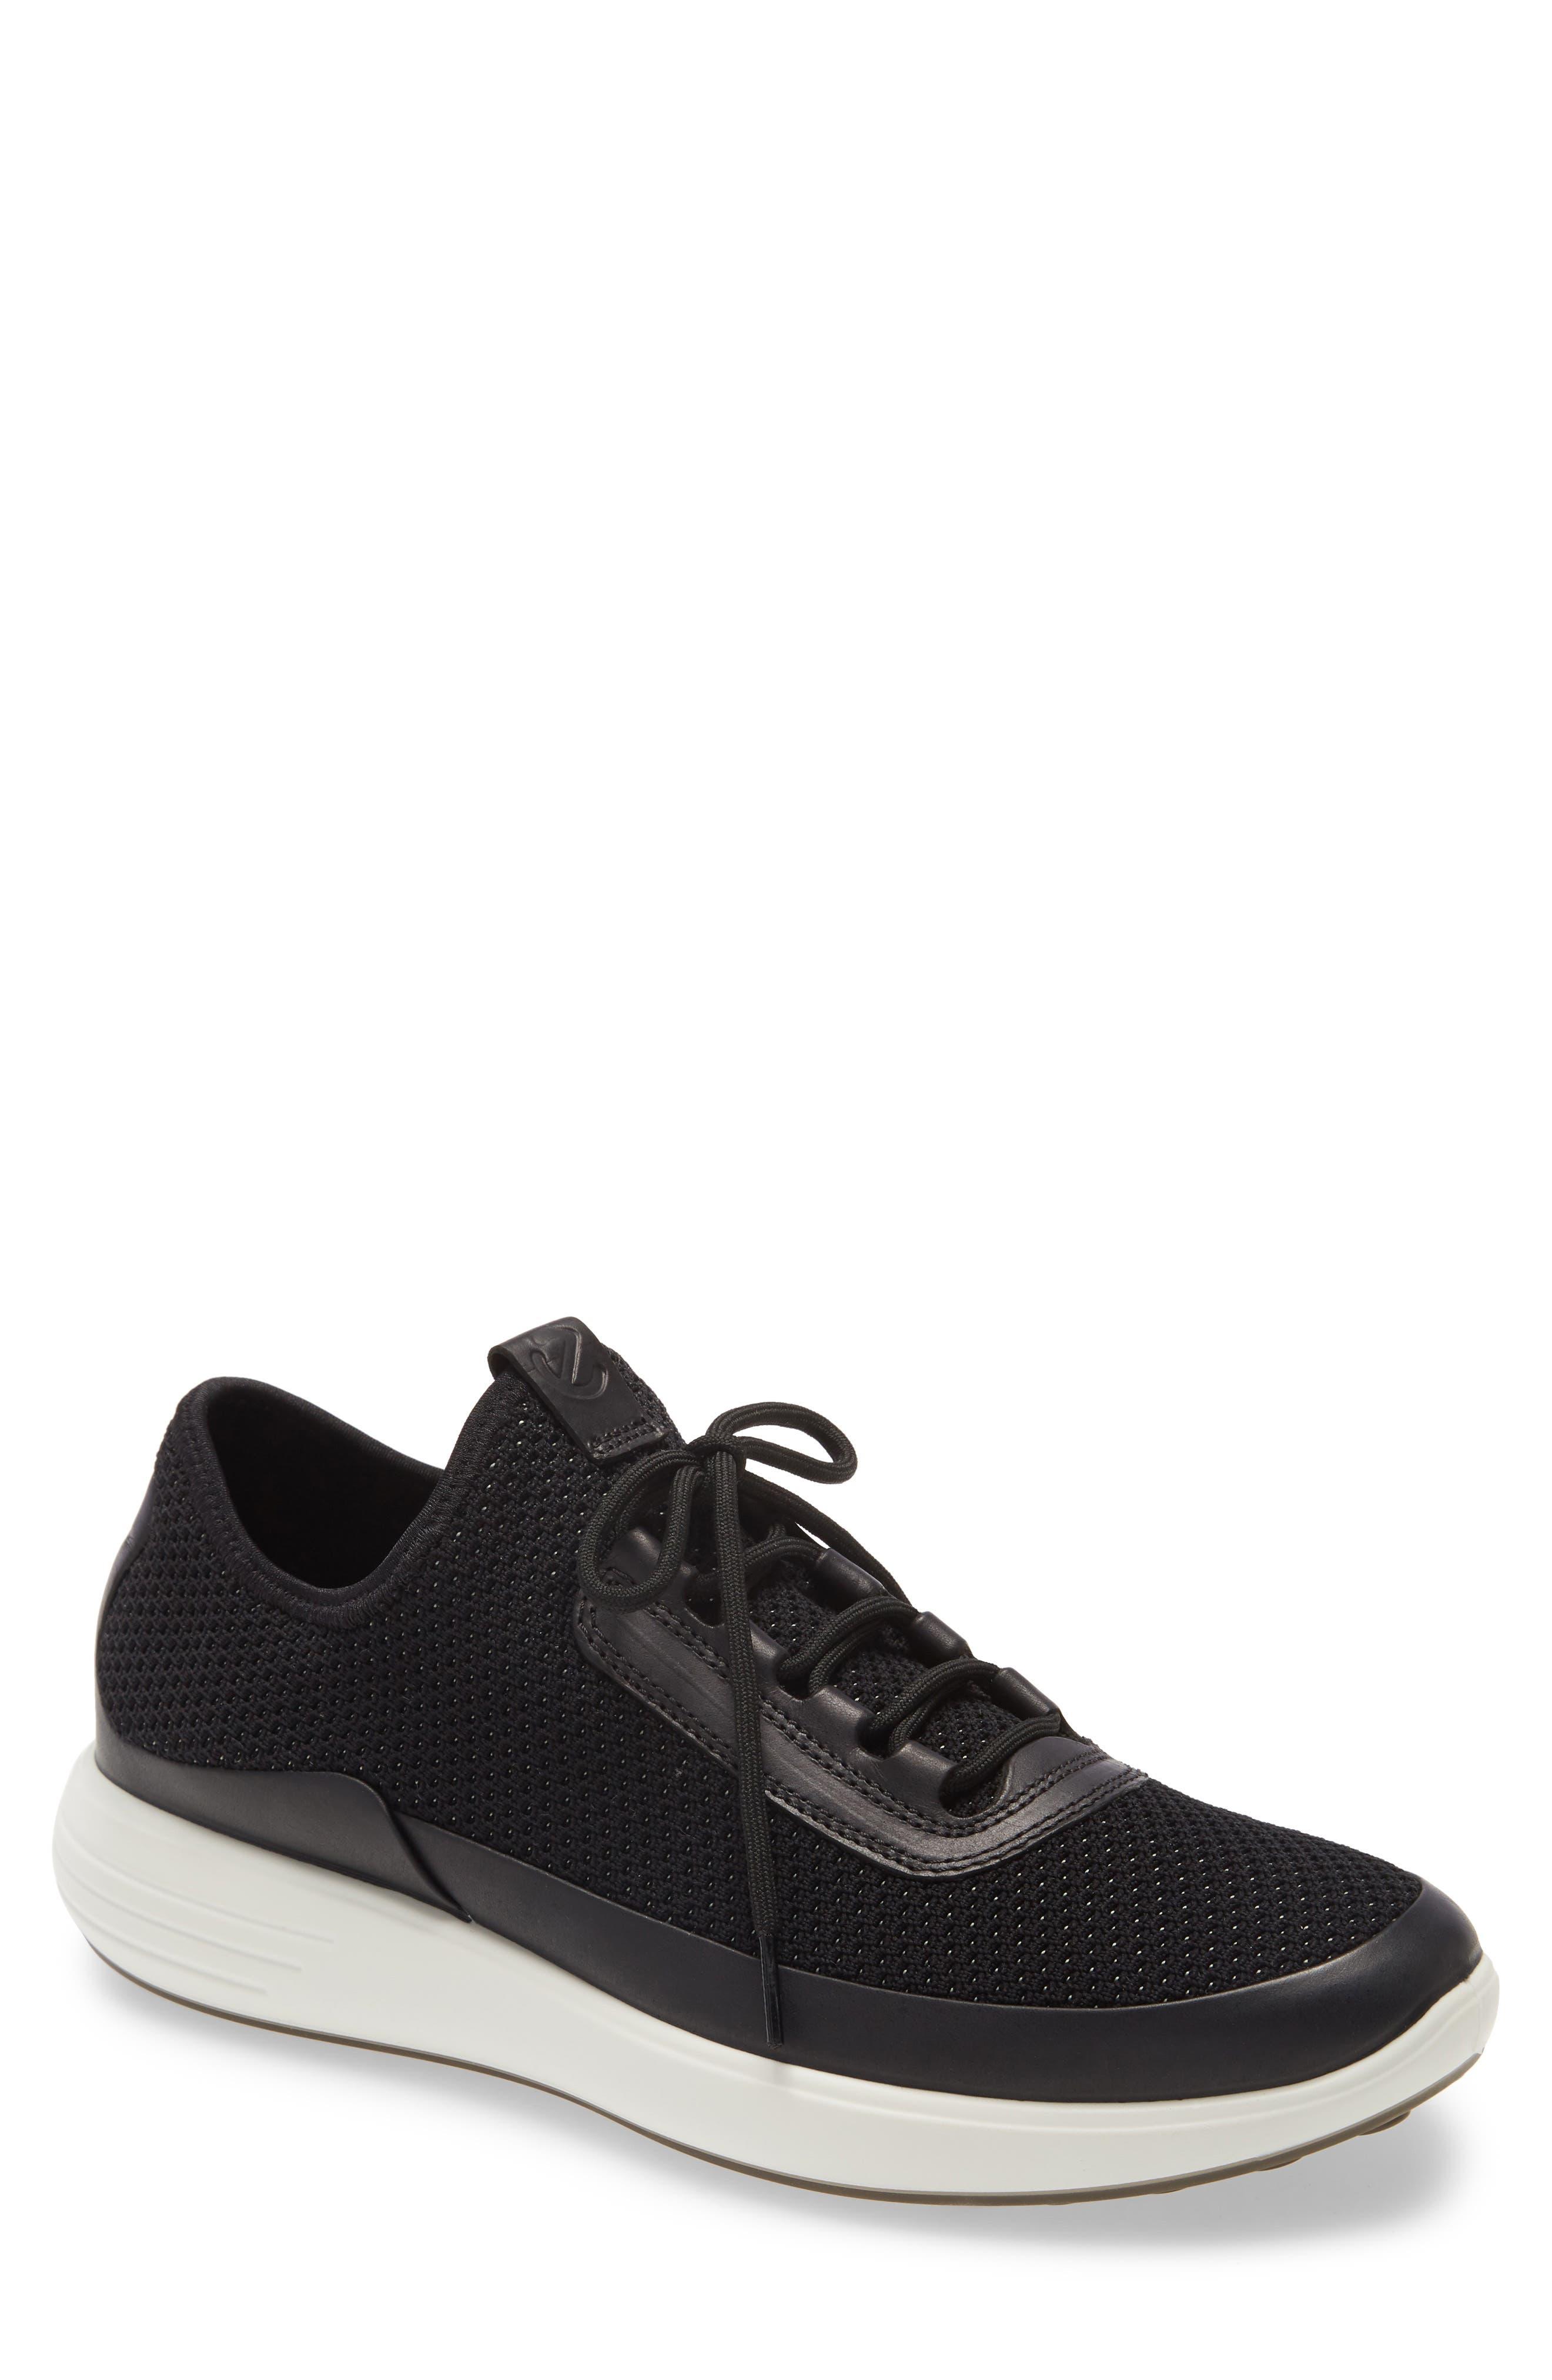 ECCO | Soft 7 Runner Summer Sneaker